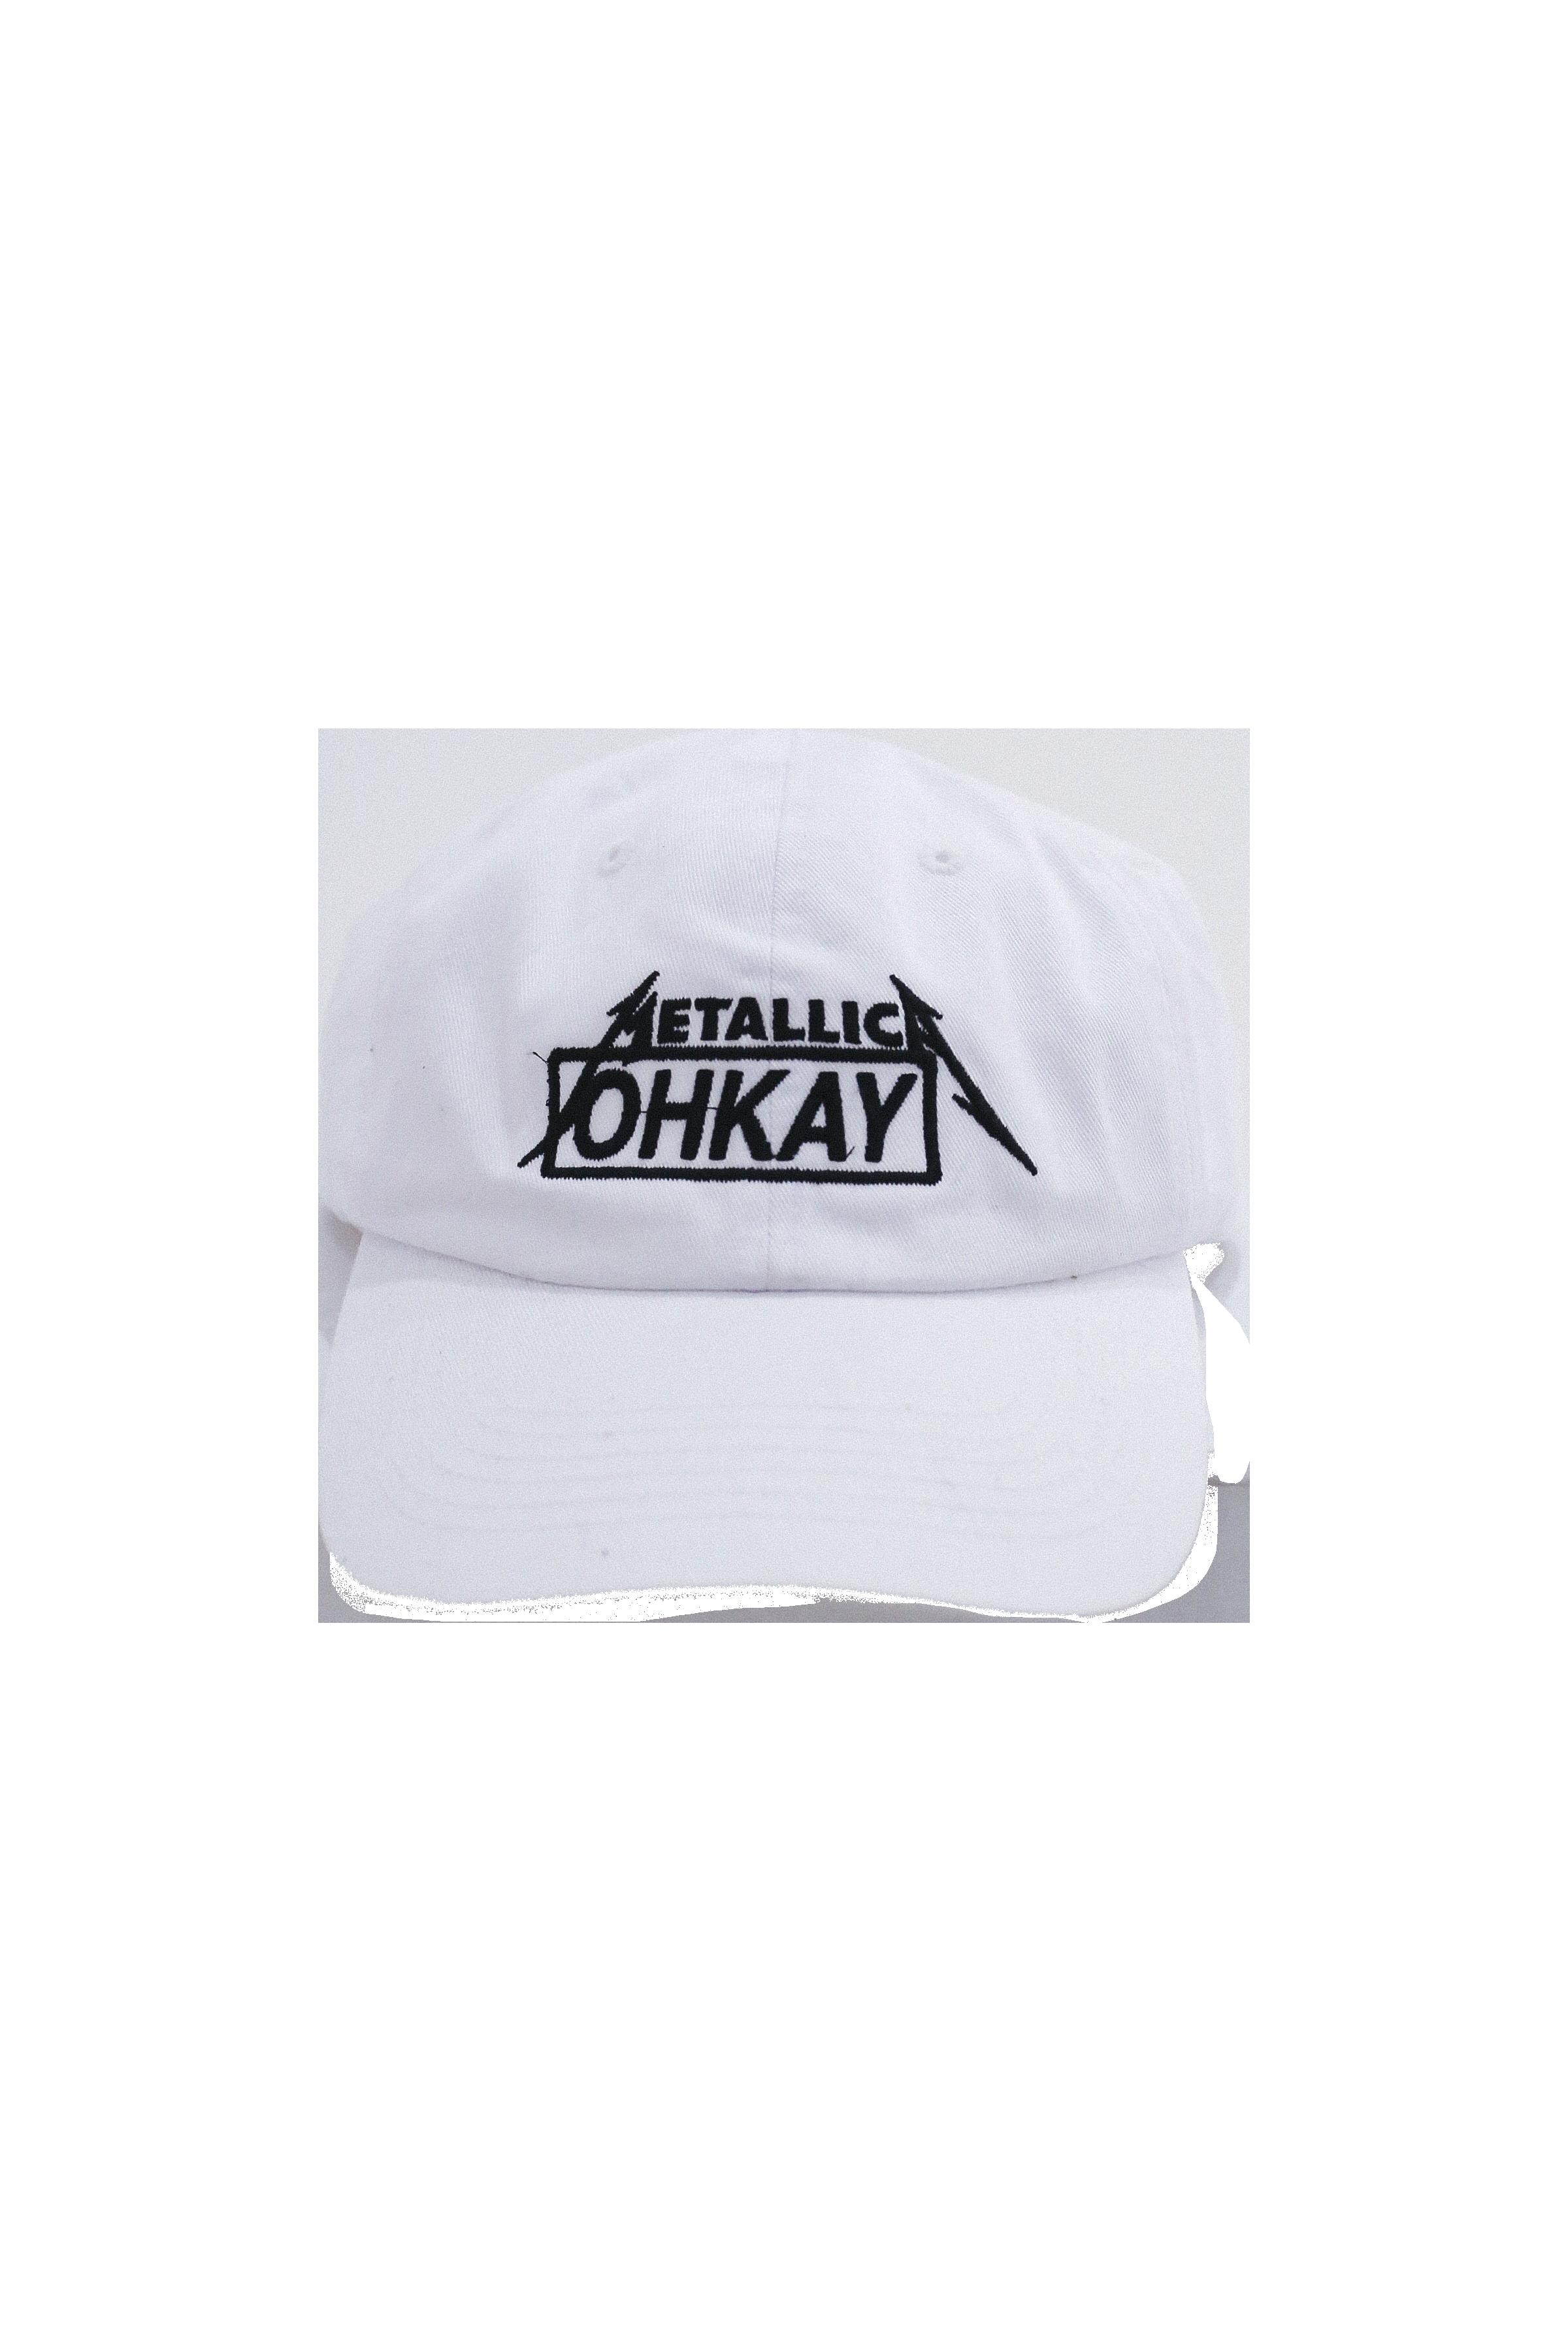 metallica hat.png